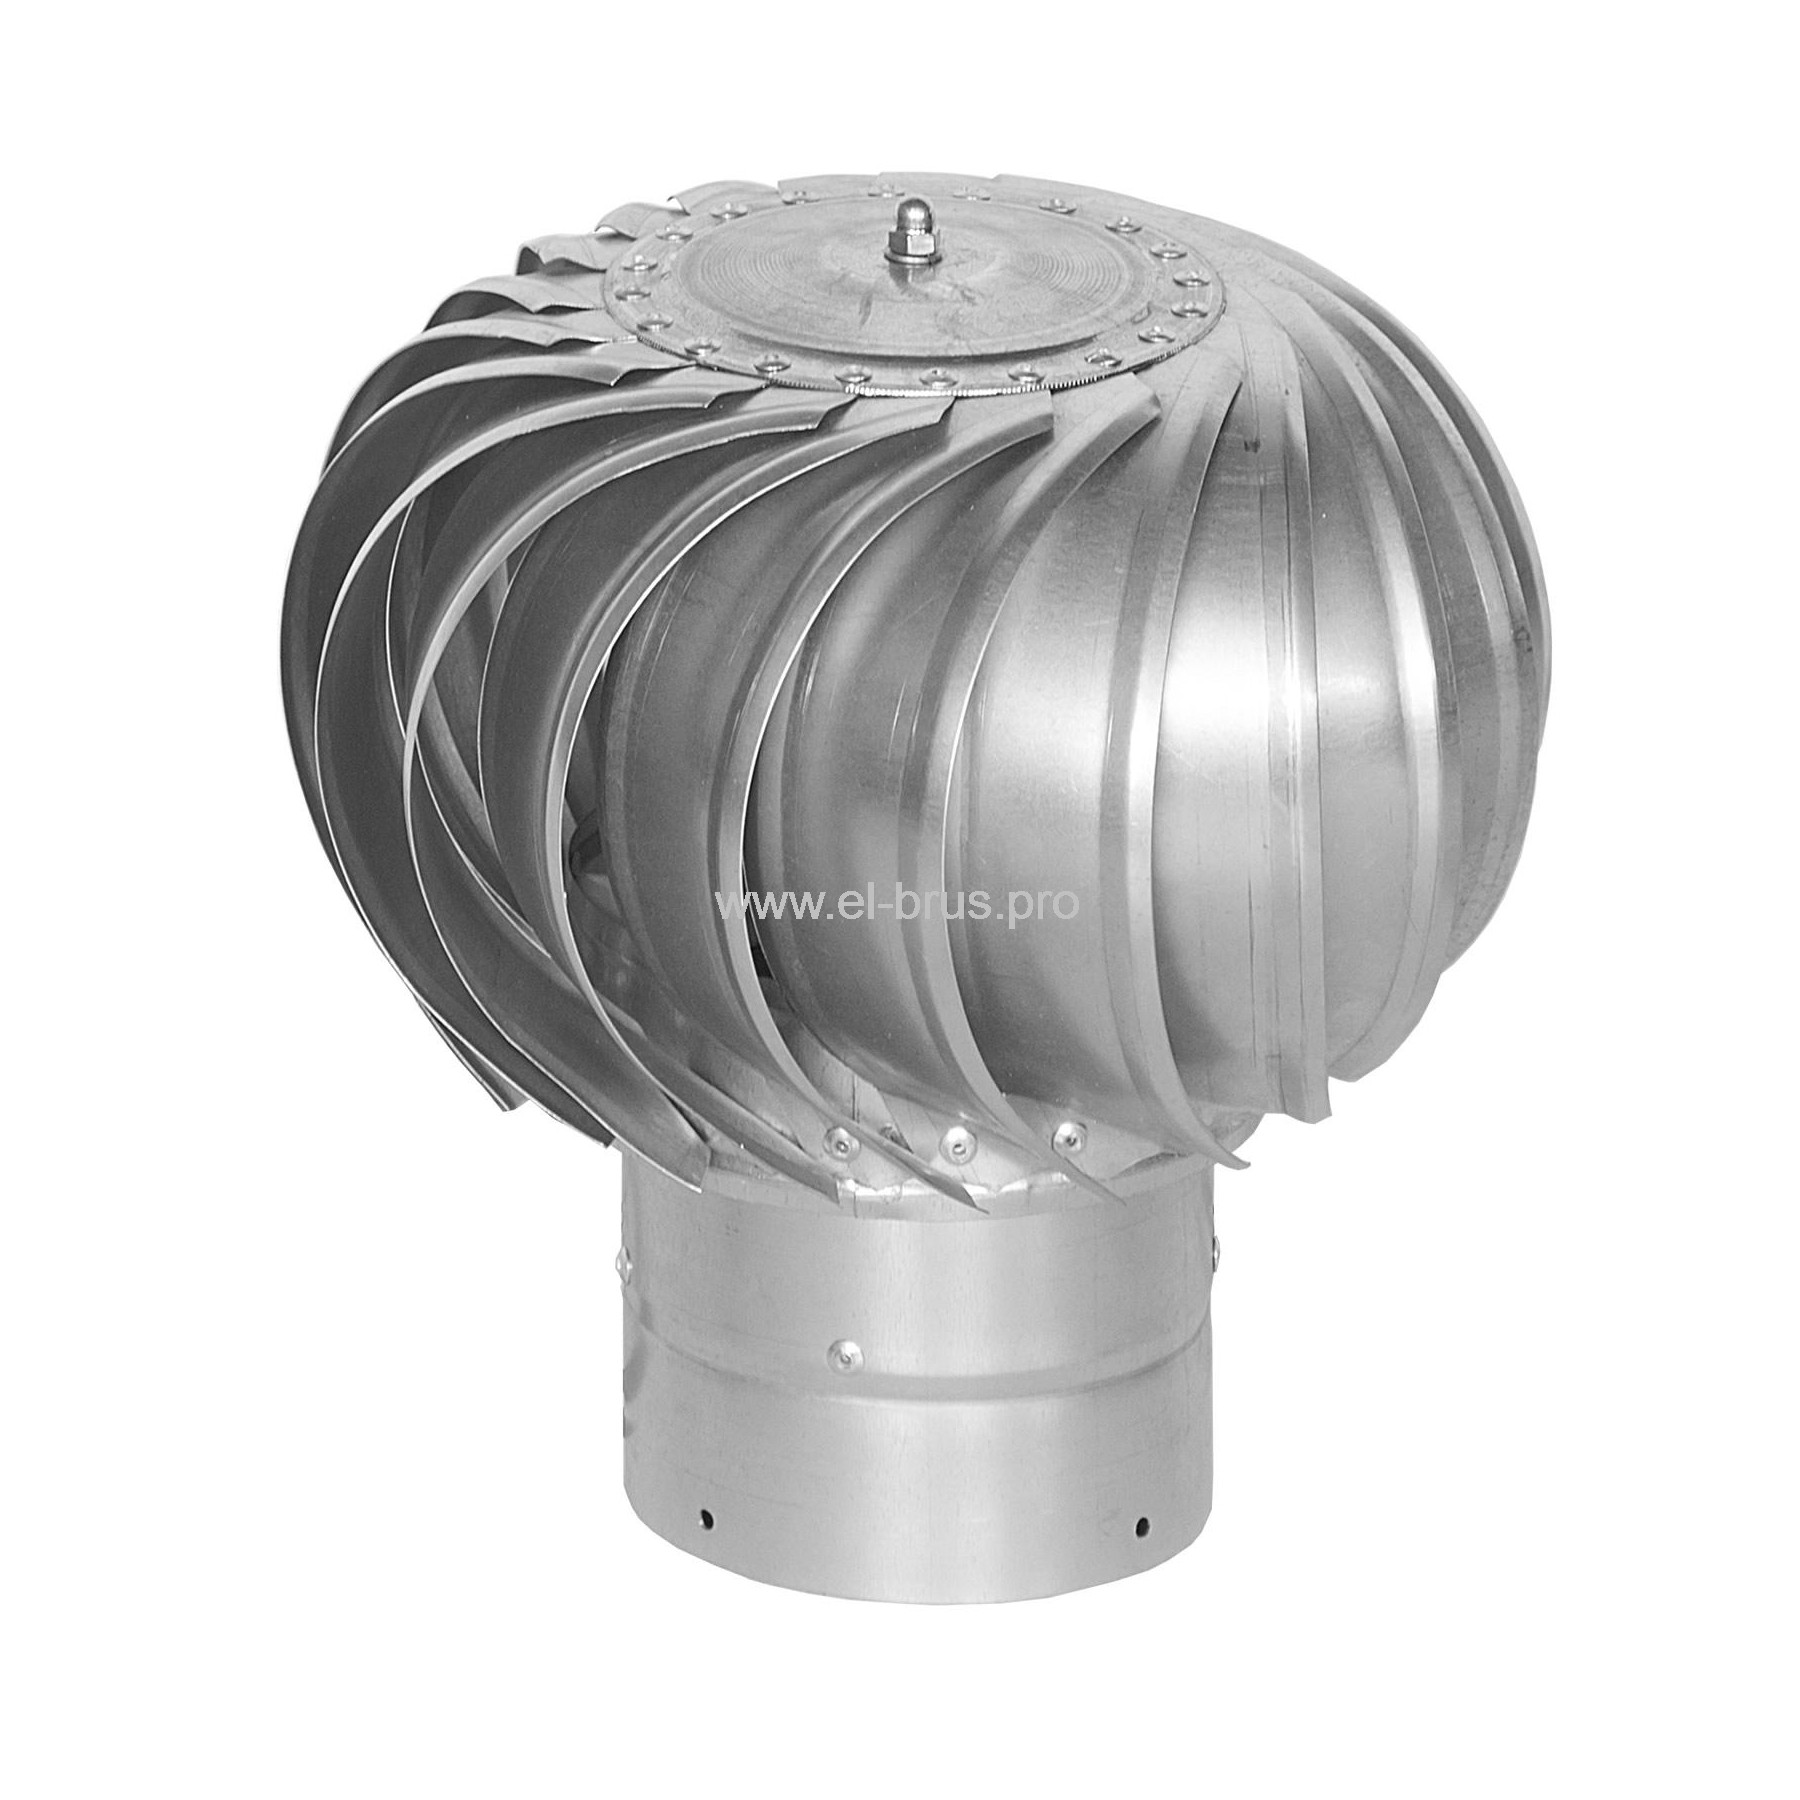 Турбодефлектор оцинк. металл Ø110мм